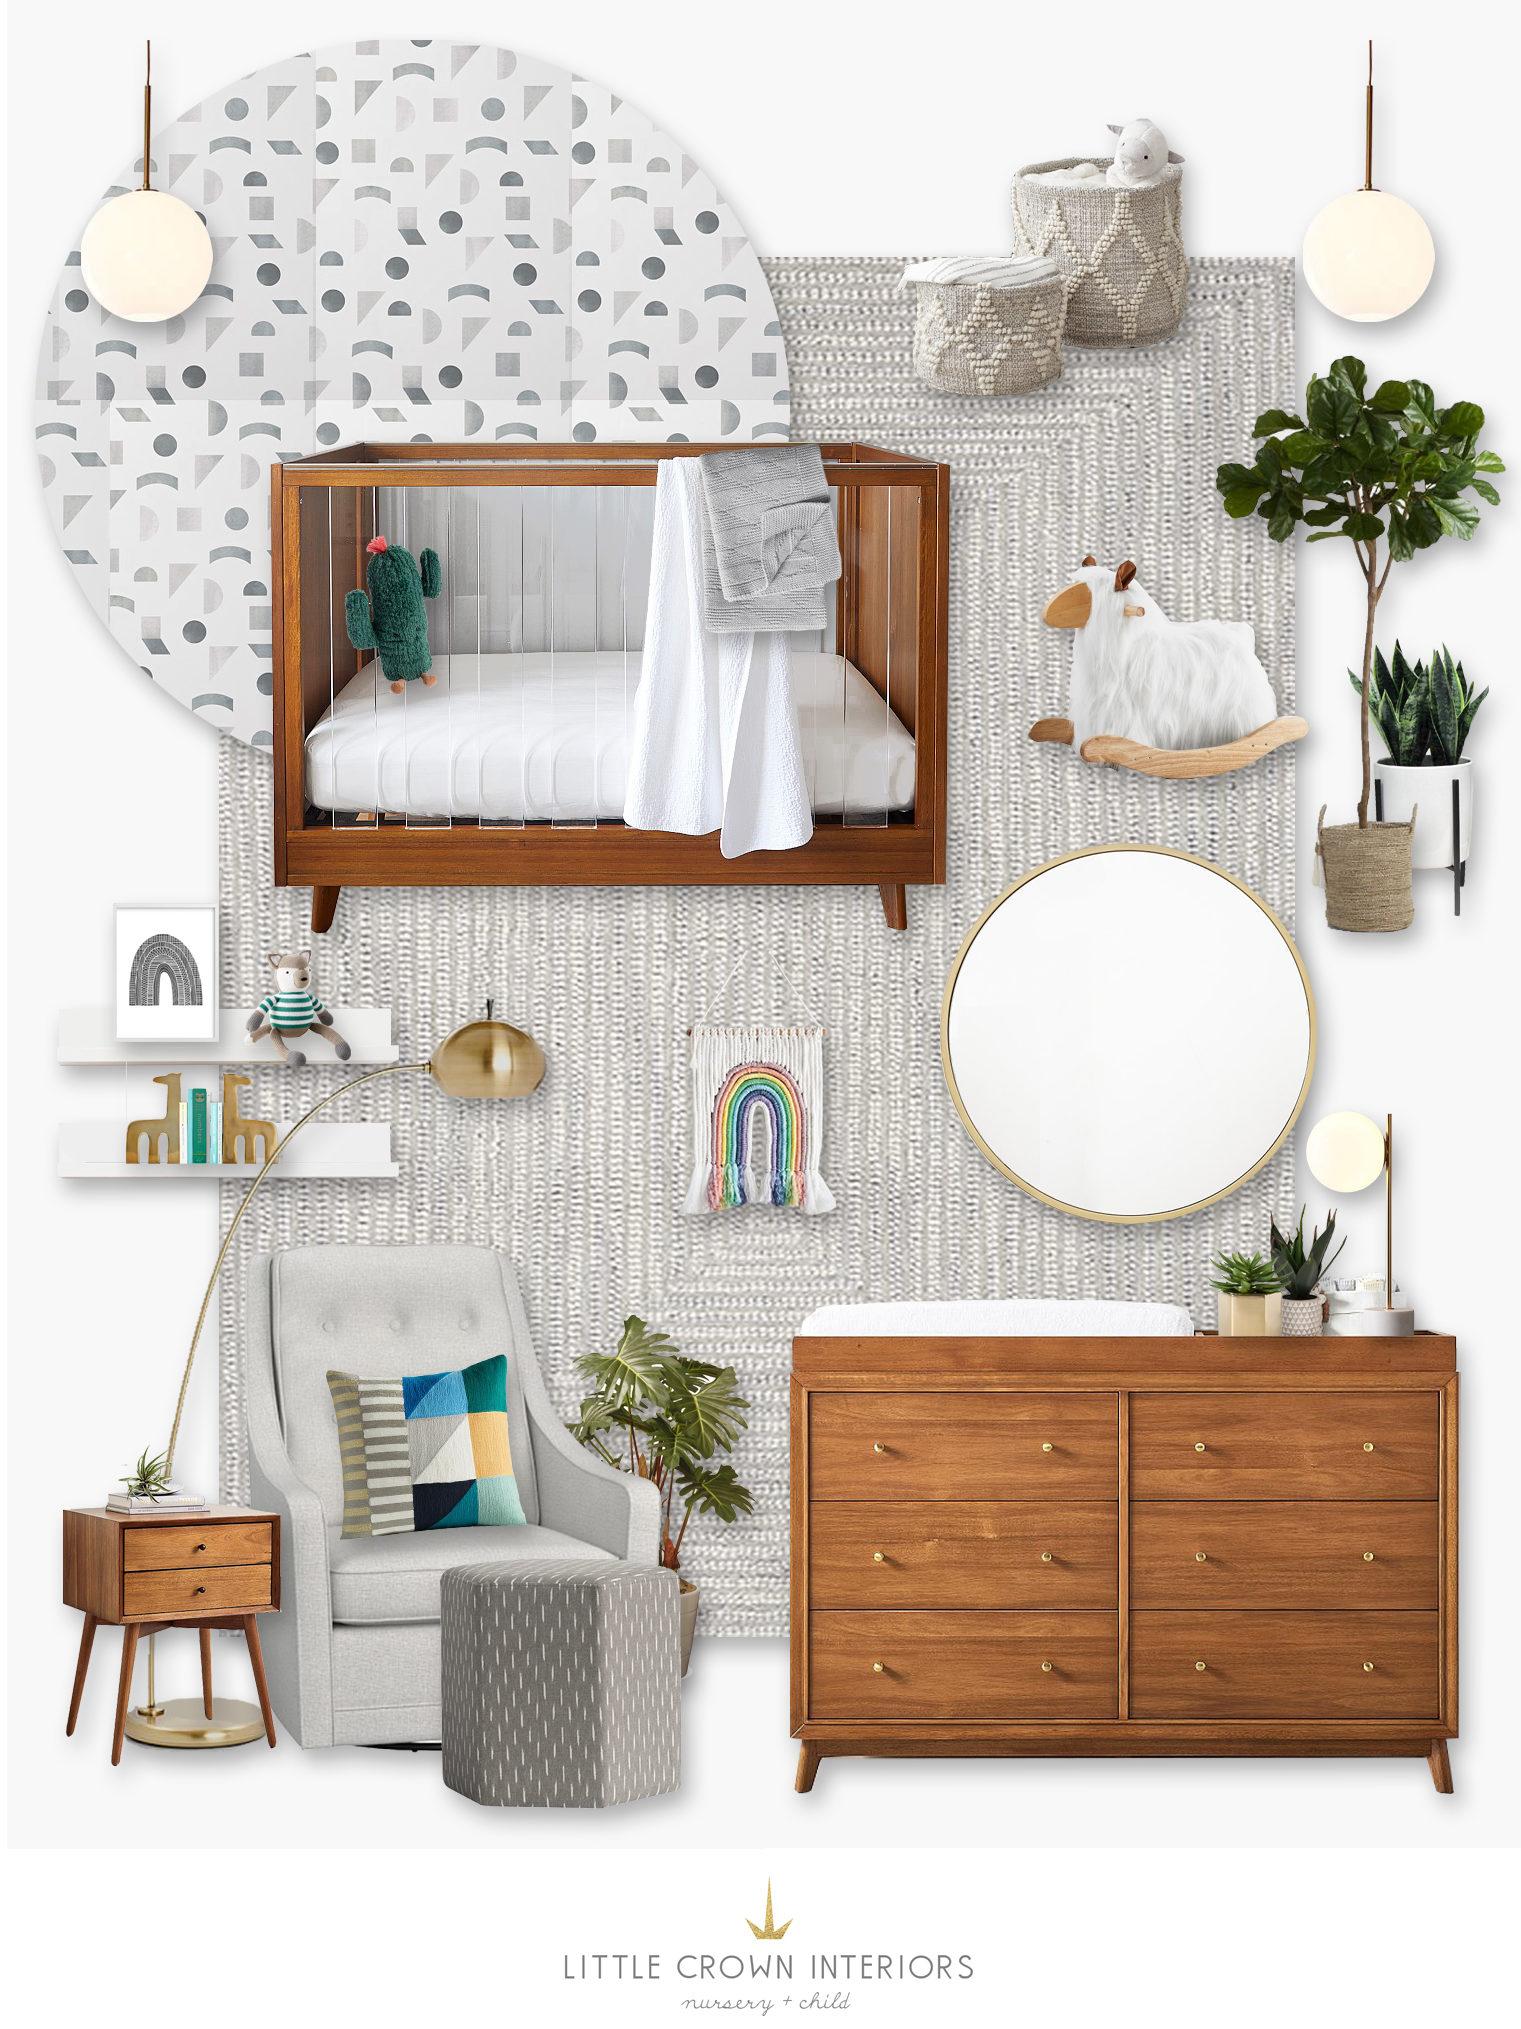 Jenna Kutcher's Nursery Design Board by Little Crown Interiors